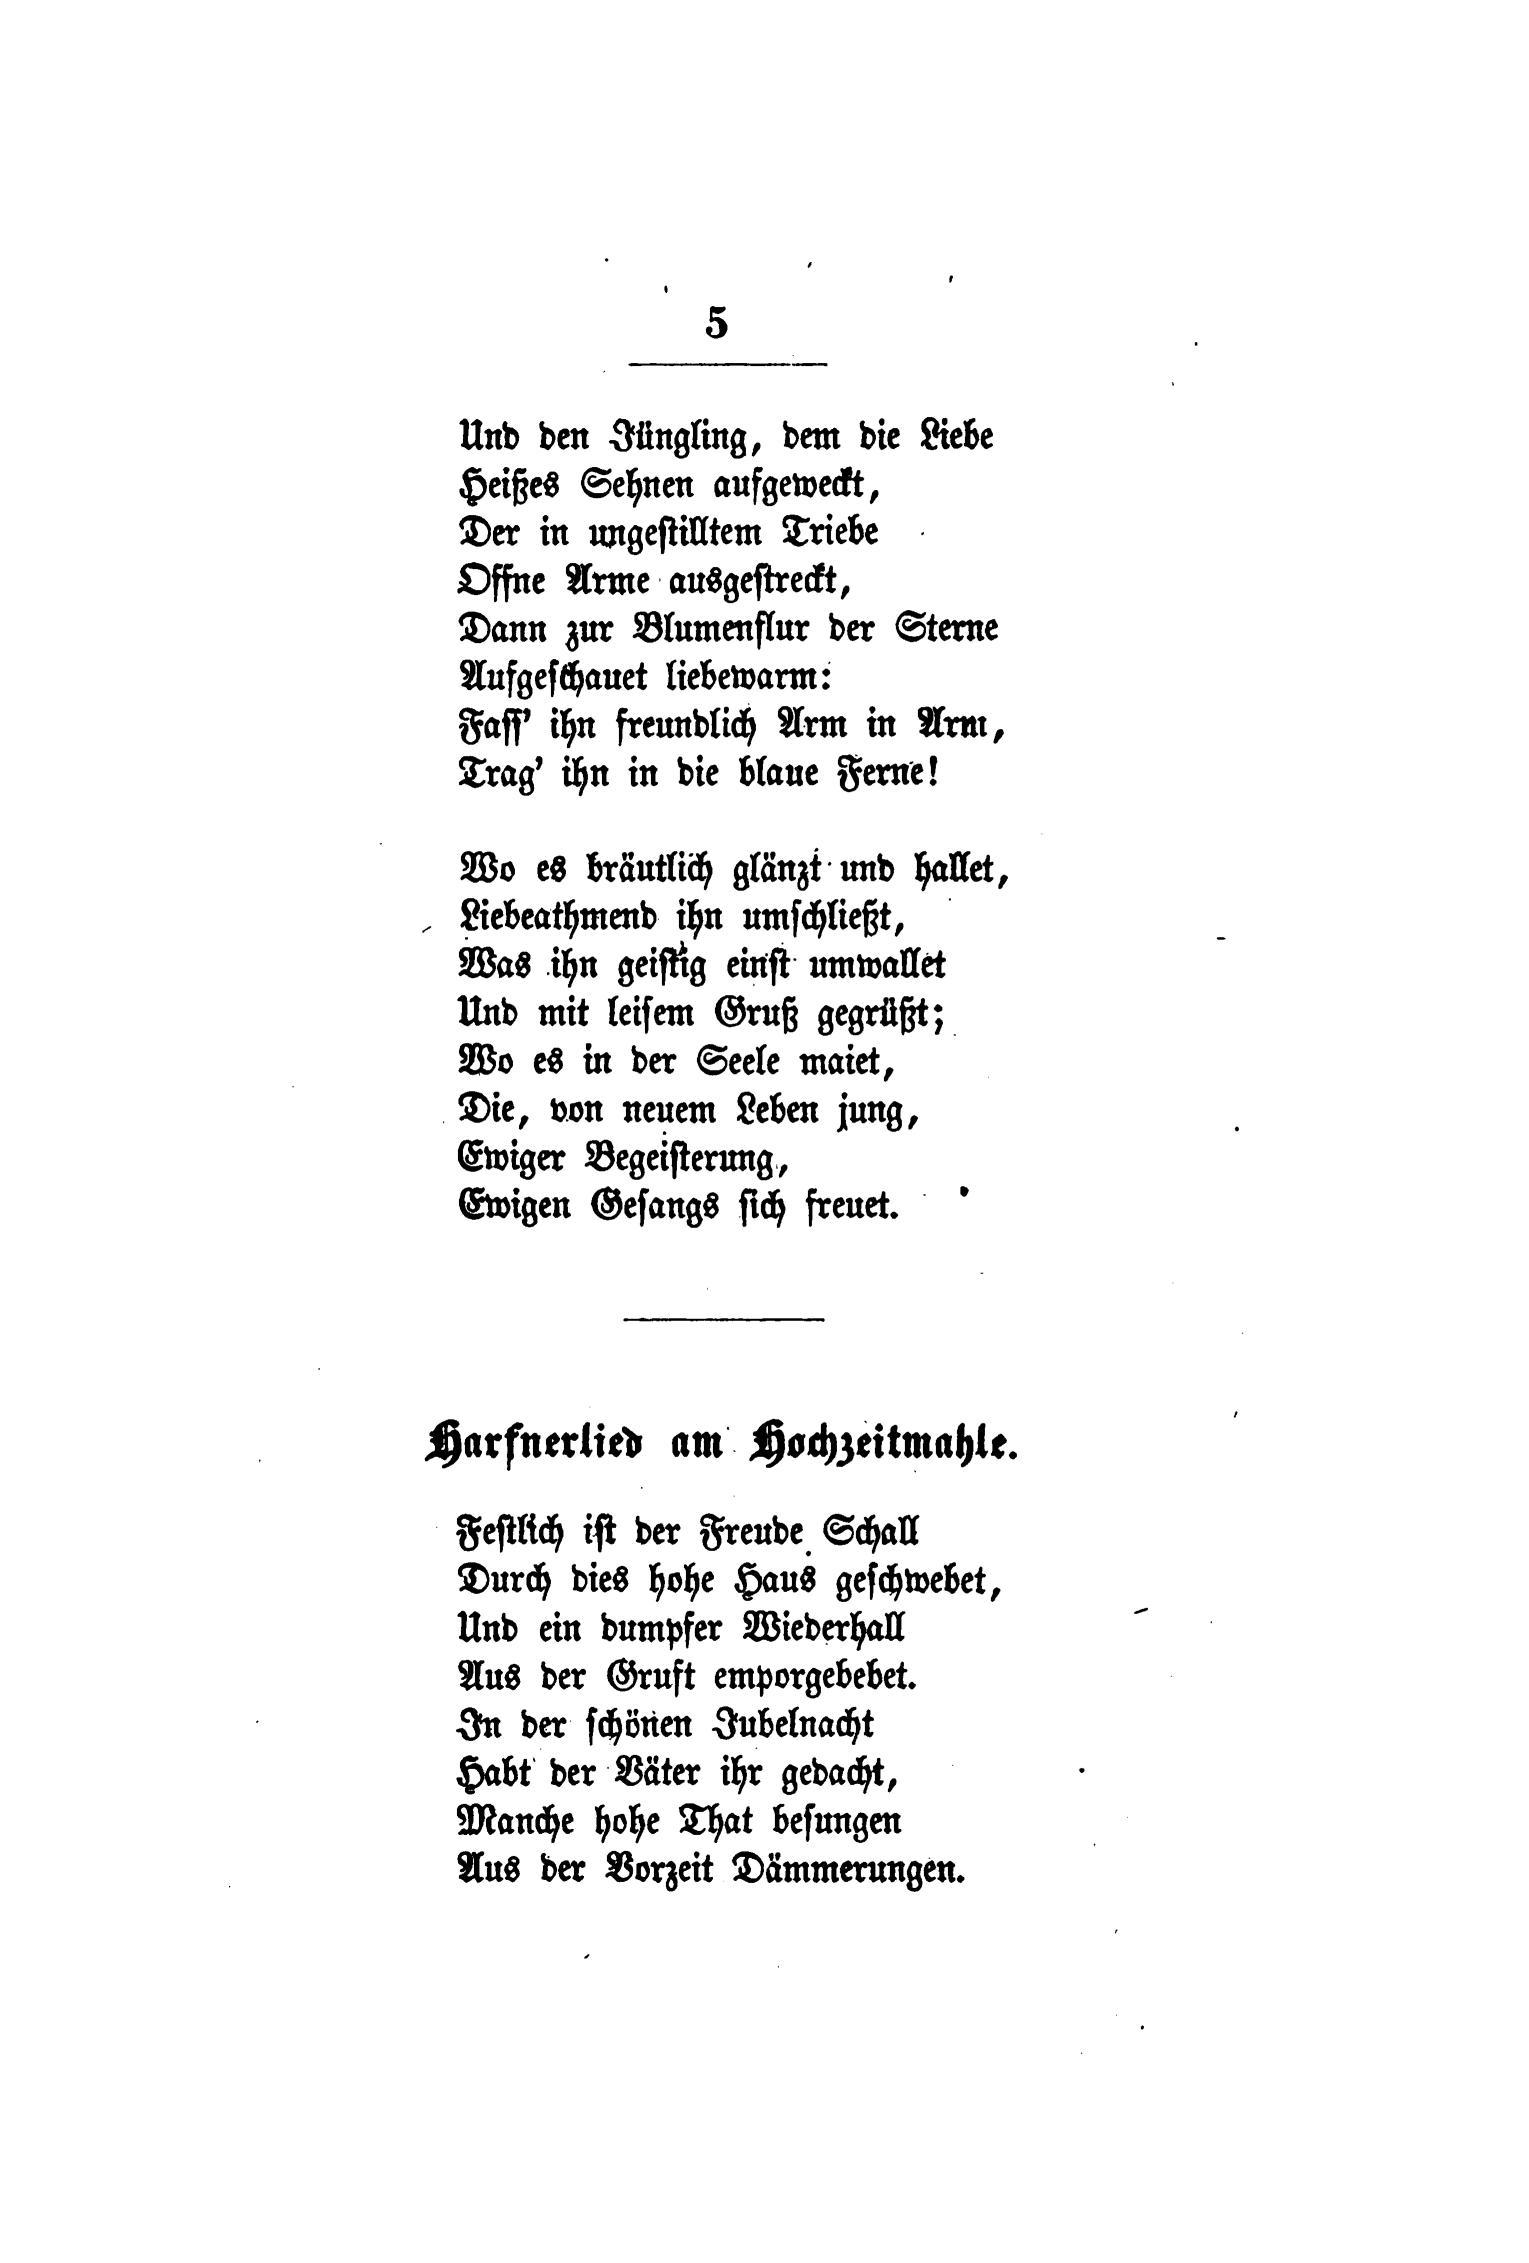 File:De Gedichte (Uhland) 029.jpg - Wikimedia Commons